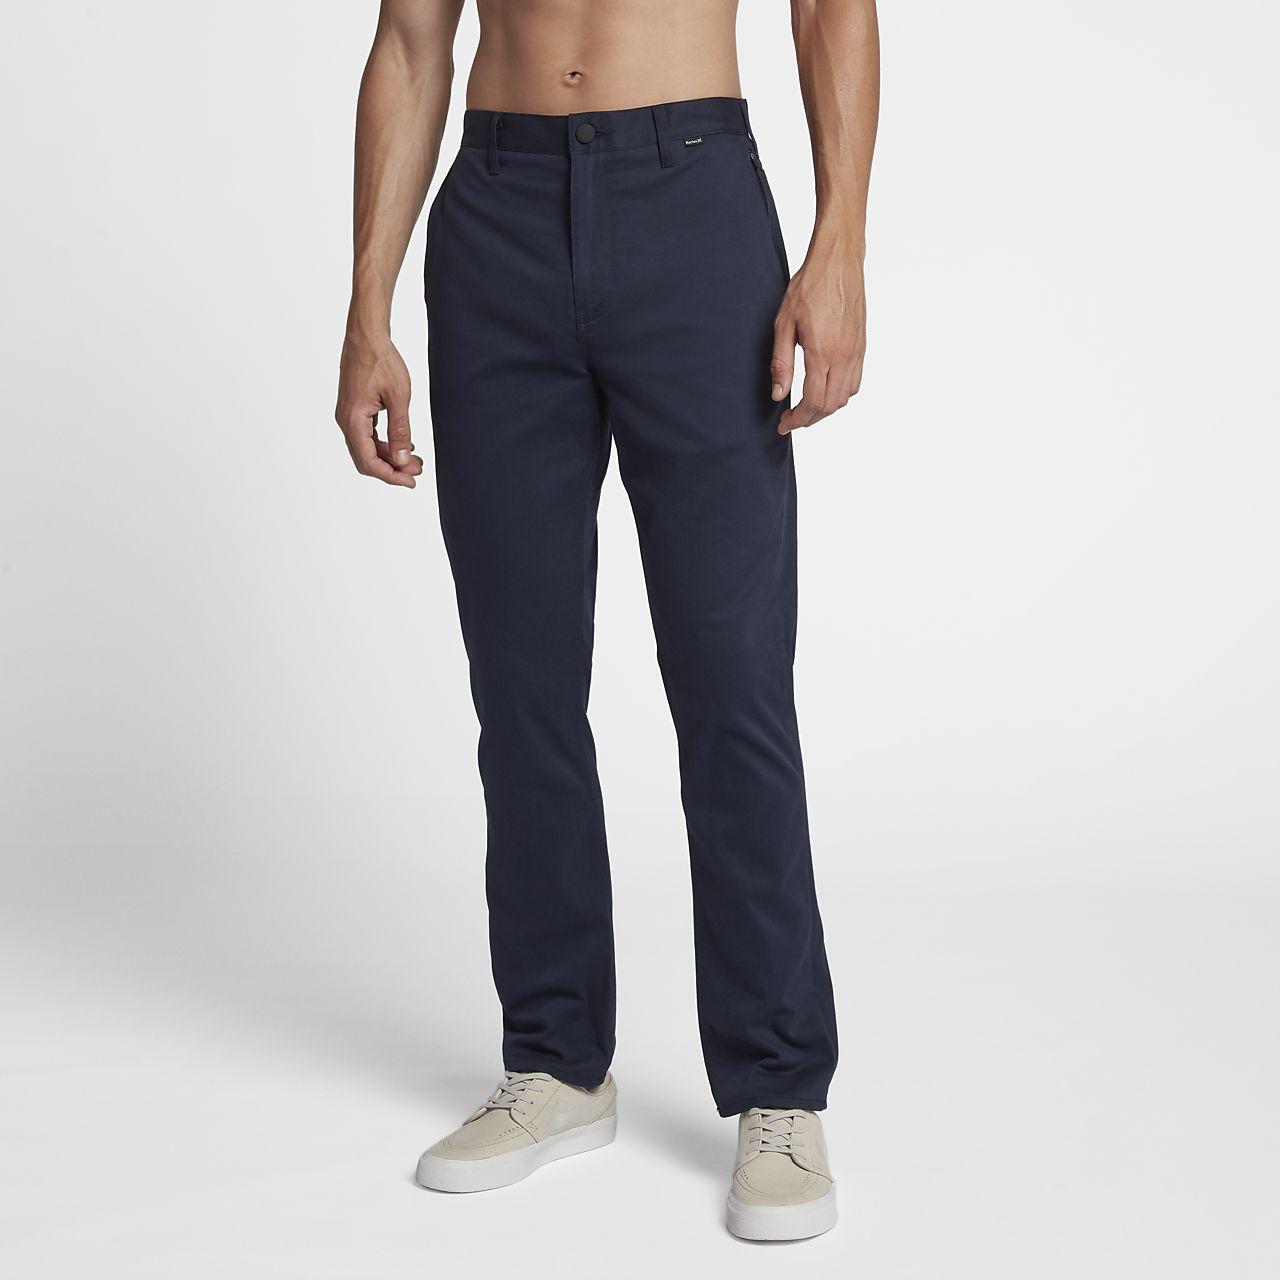 Hurley Dri-FIT Worker Erkek Pantolonu